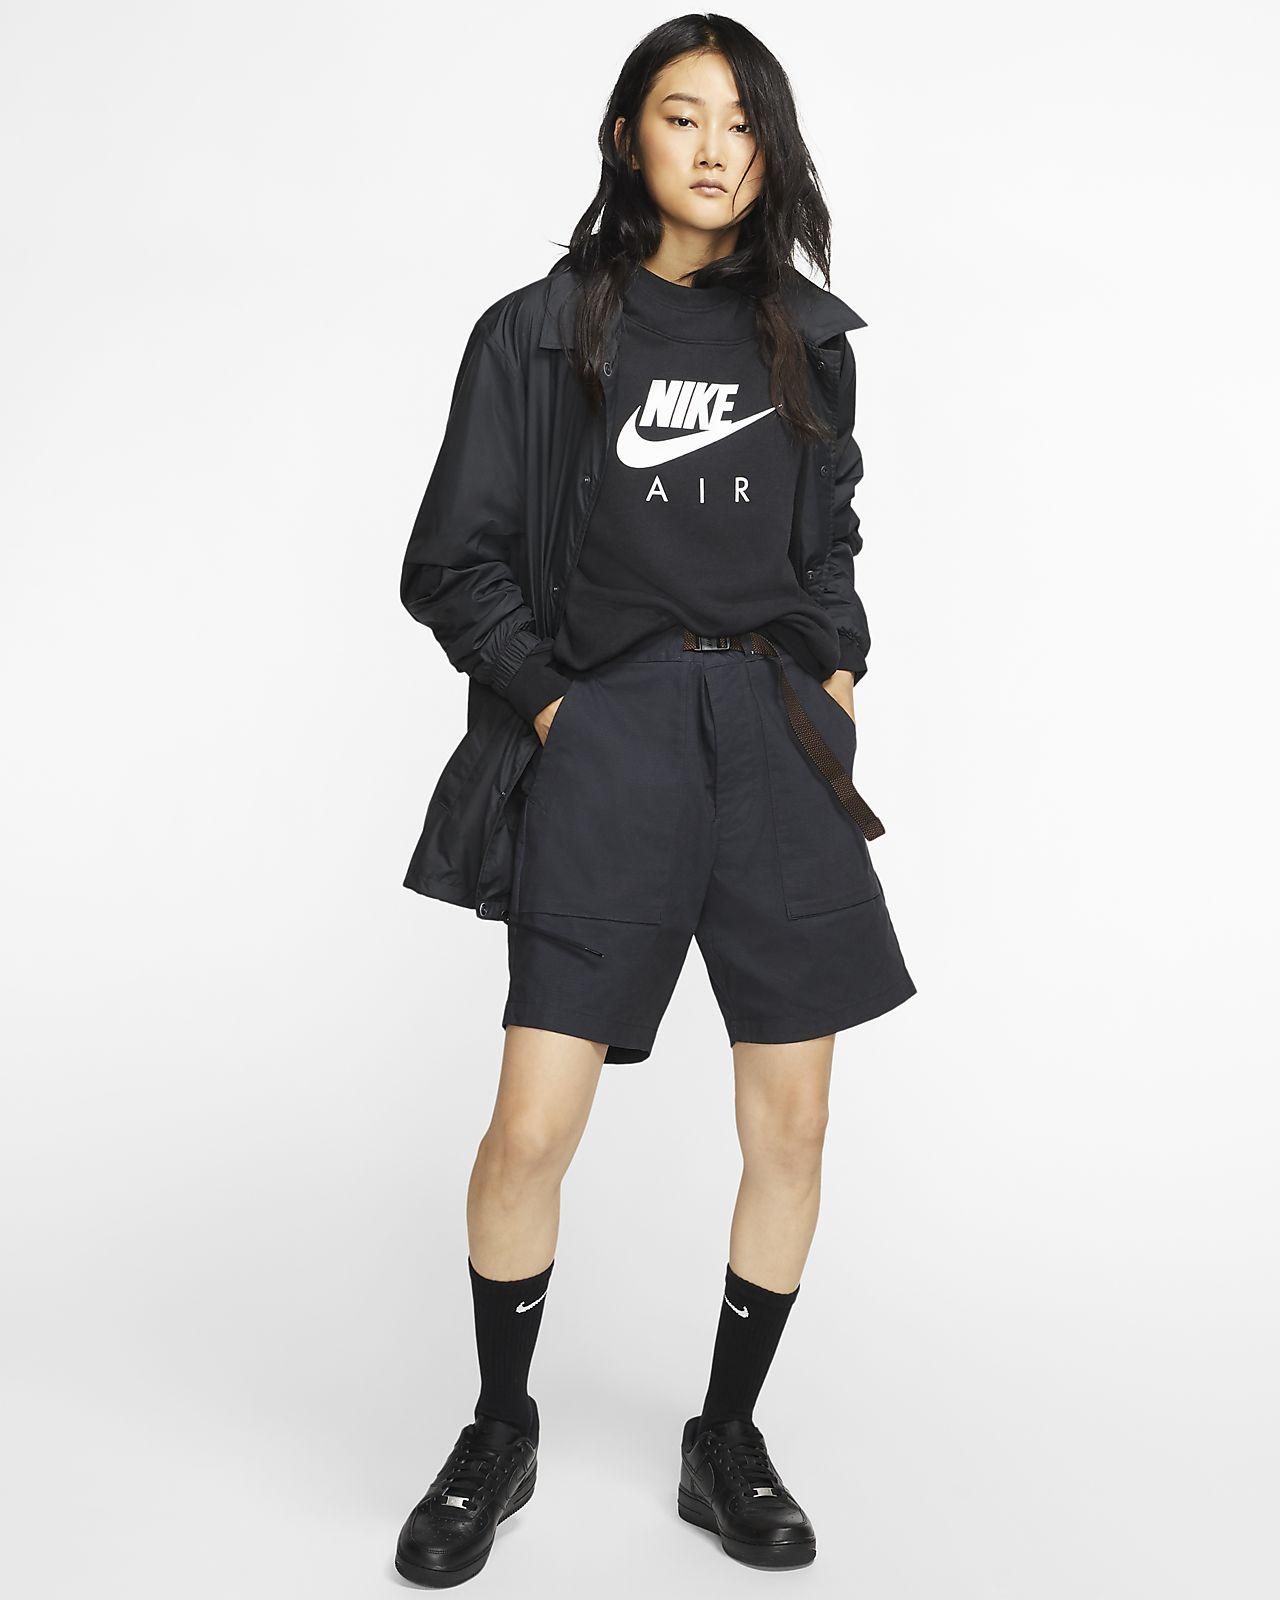 Nike Air Women's Hoodie blackwhite BV5132 010